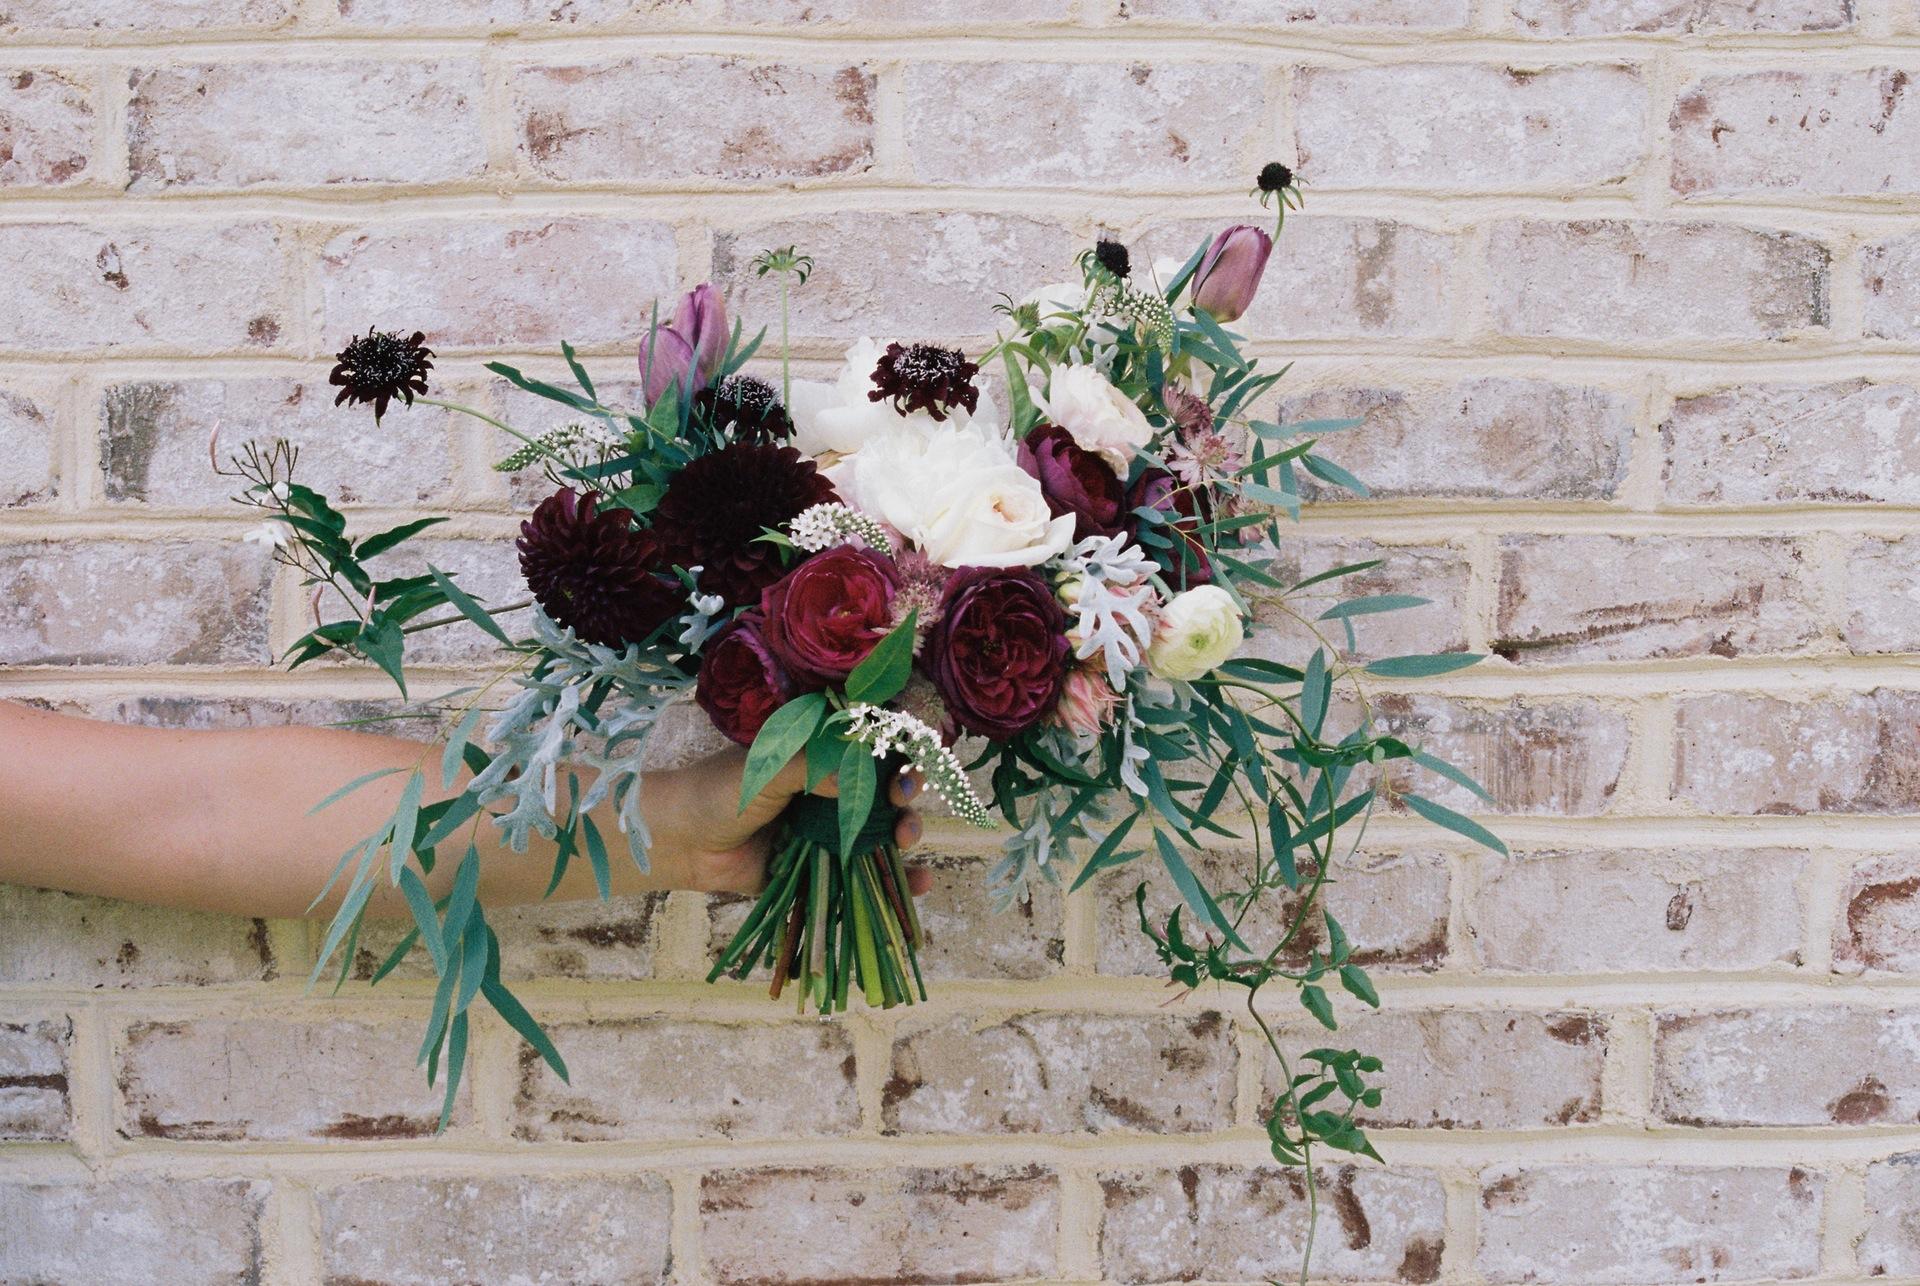 Botanicals Flowers Events Botanicals Flowers Events